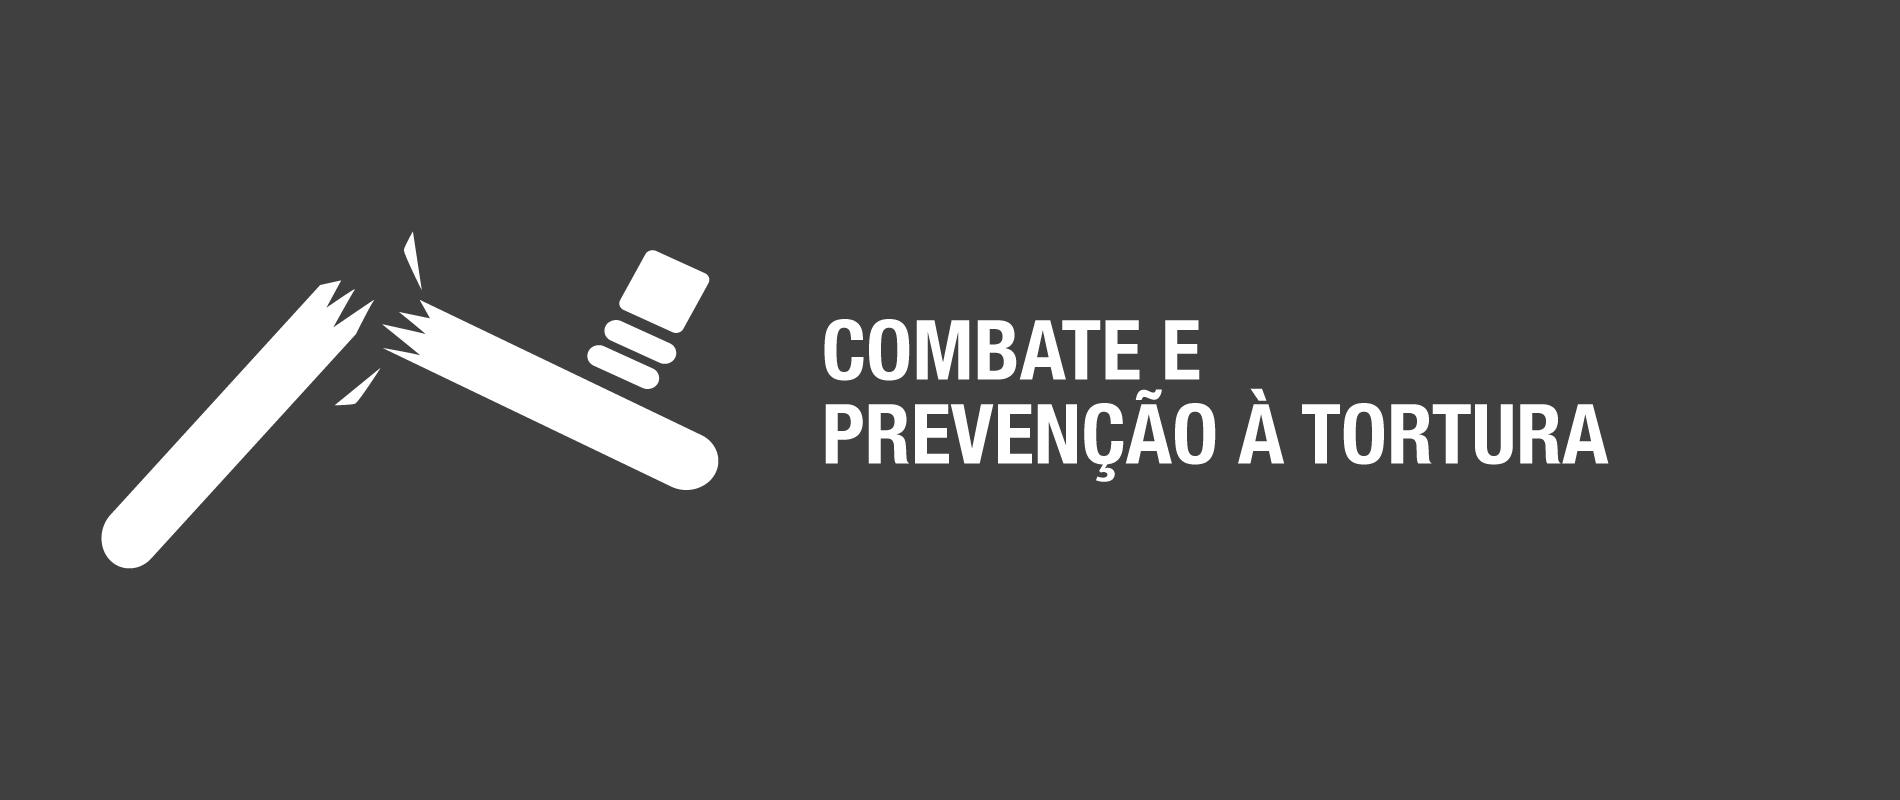 tela_face_combate